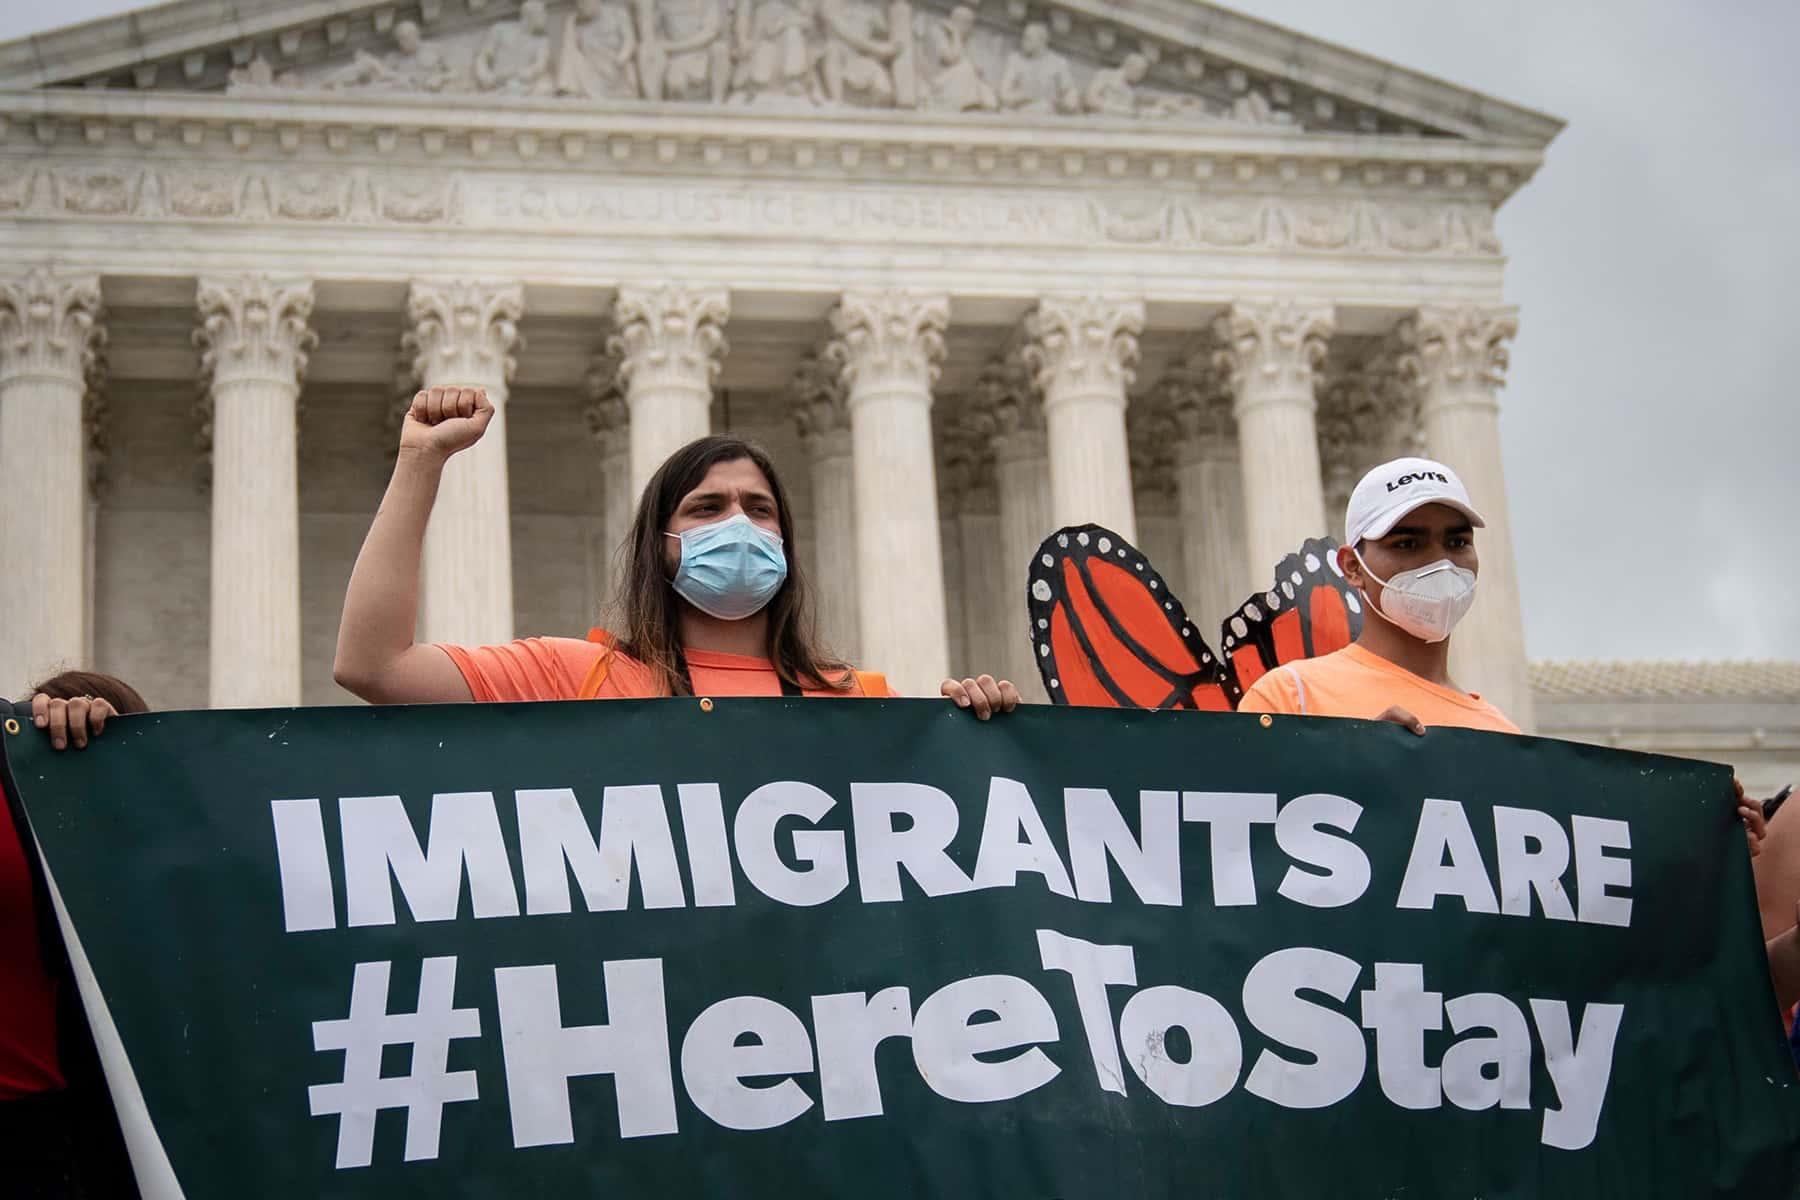 Judge orders Trump to restore undocumented immigrants scheme